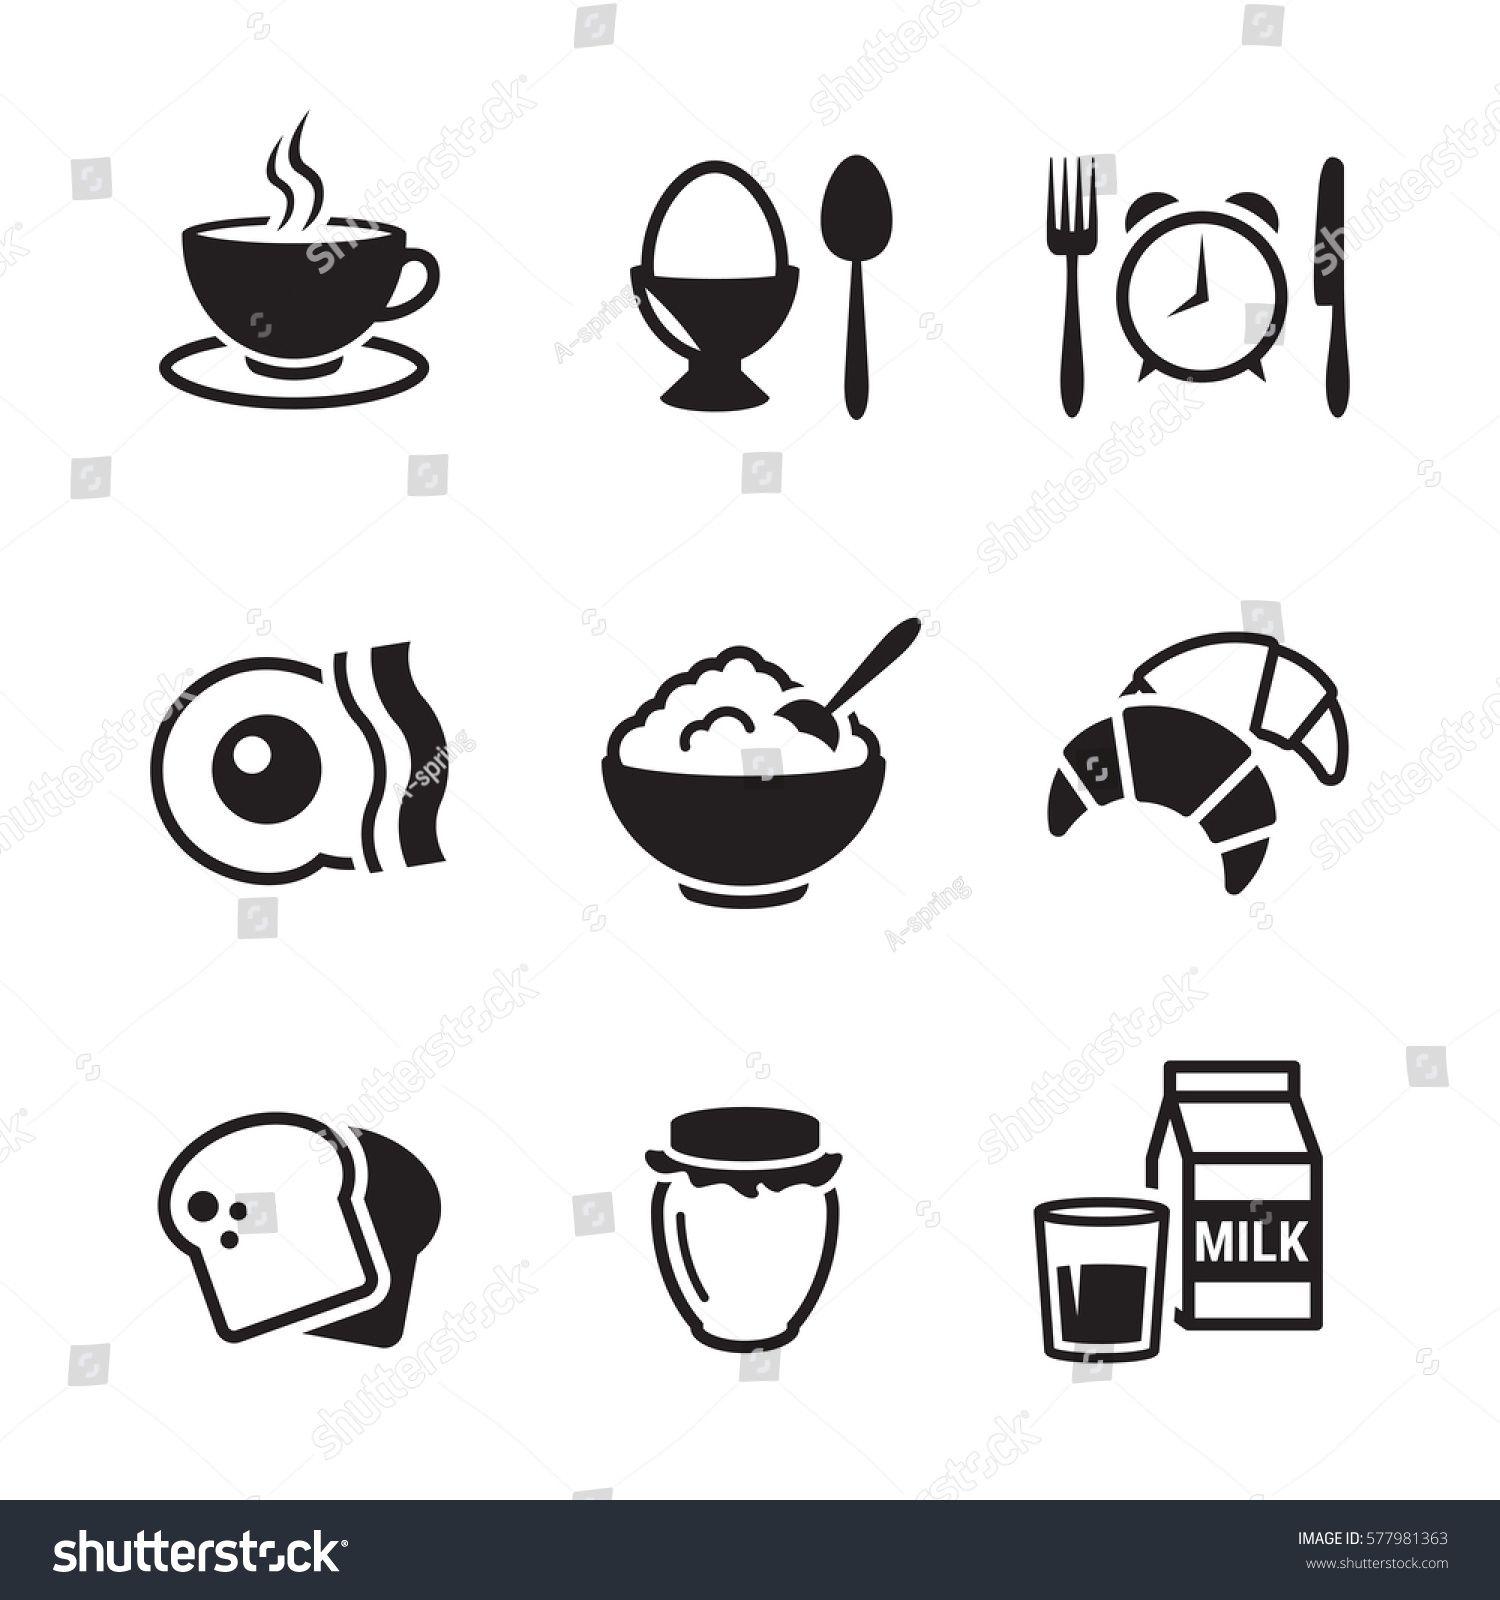 Breakfast Icons Set Black On A White Background Ad Affiliate Set Icons Breakfast Background Wedding Vector Icons Icon Set White Stock Image